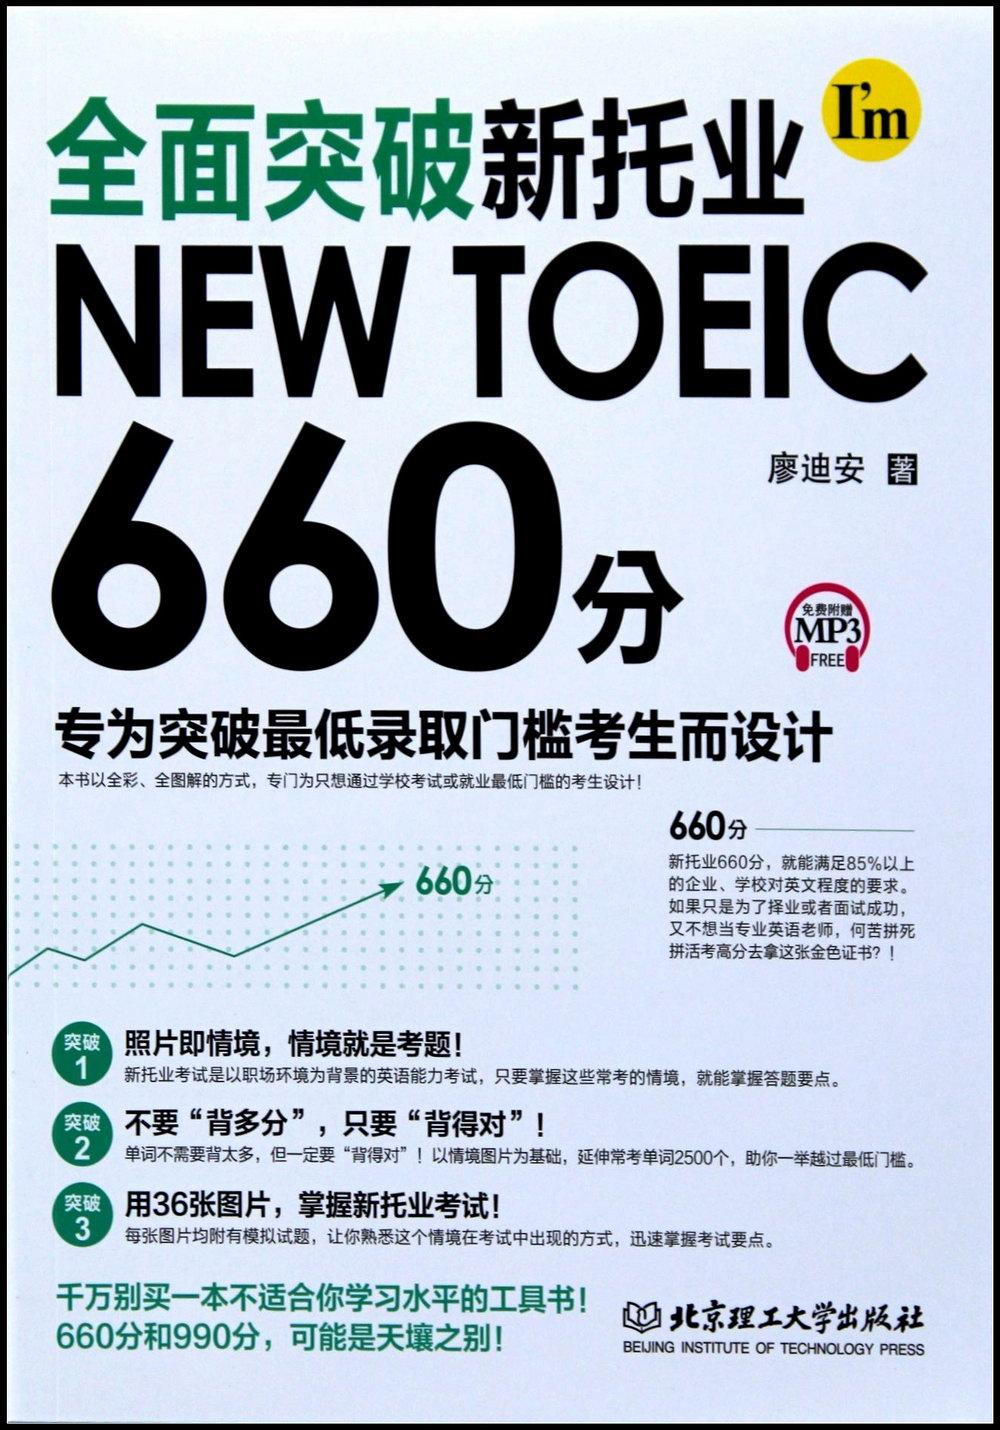 全面突破新托業NEW TOEIC 660分